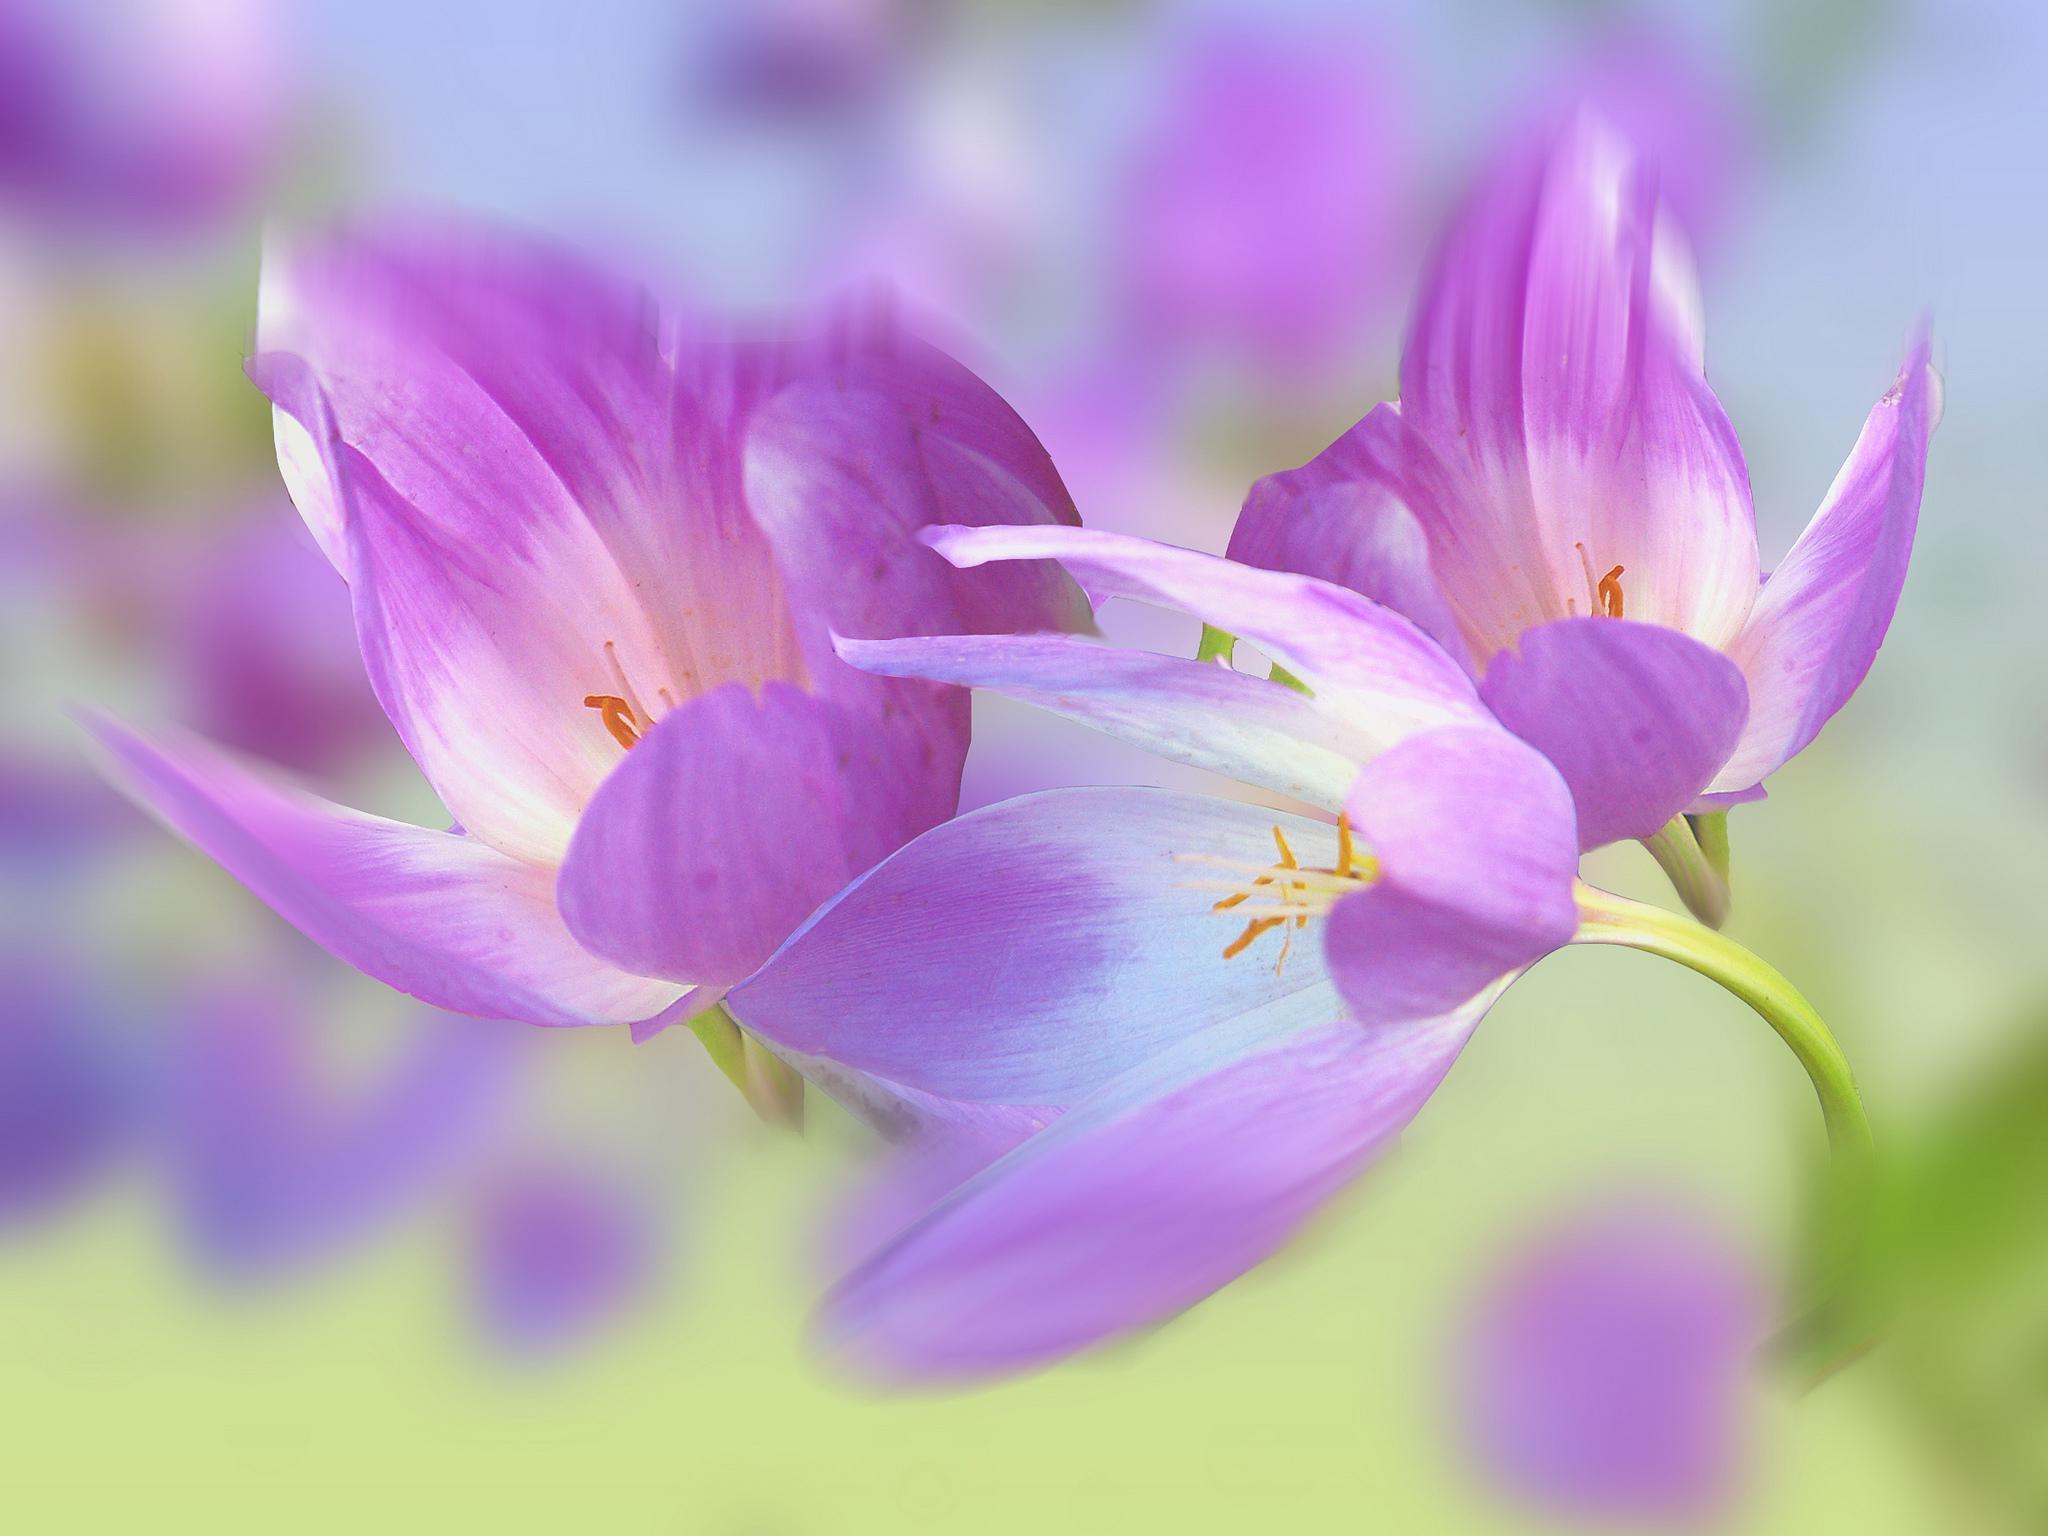 обои крокусы, цветы, флора картинки фото